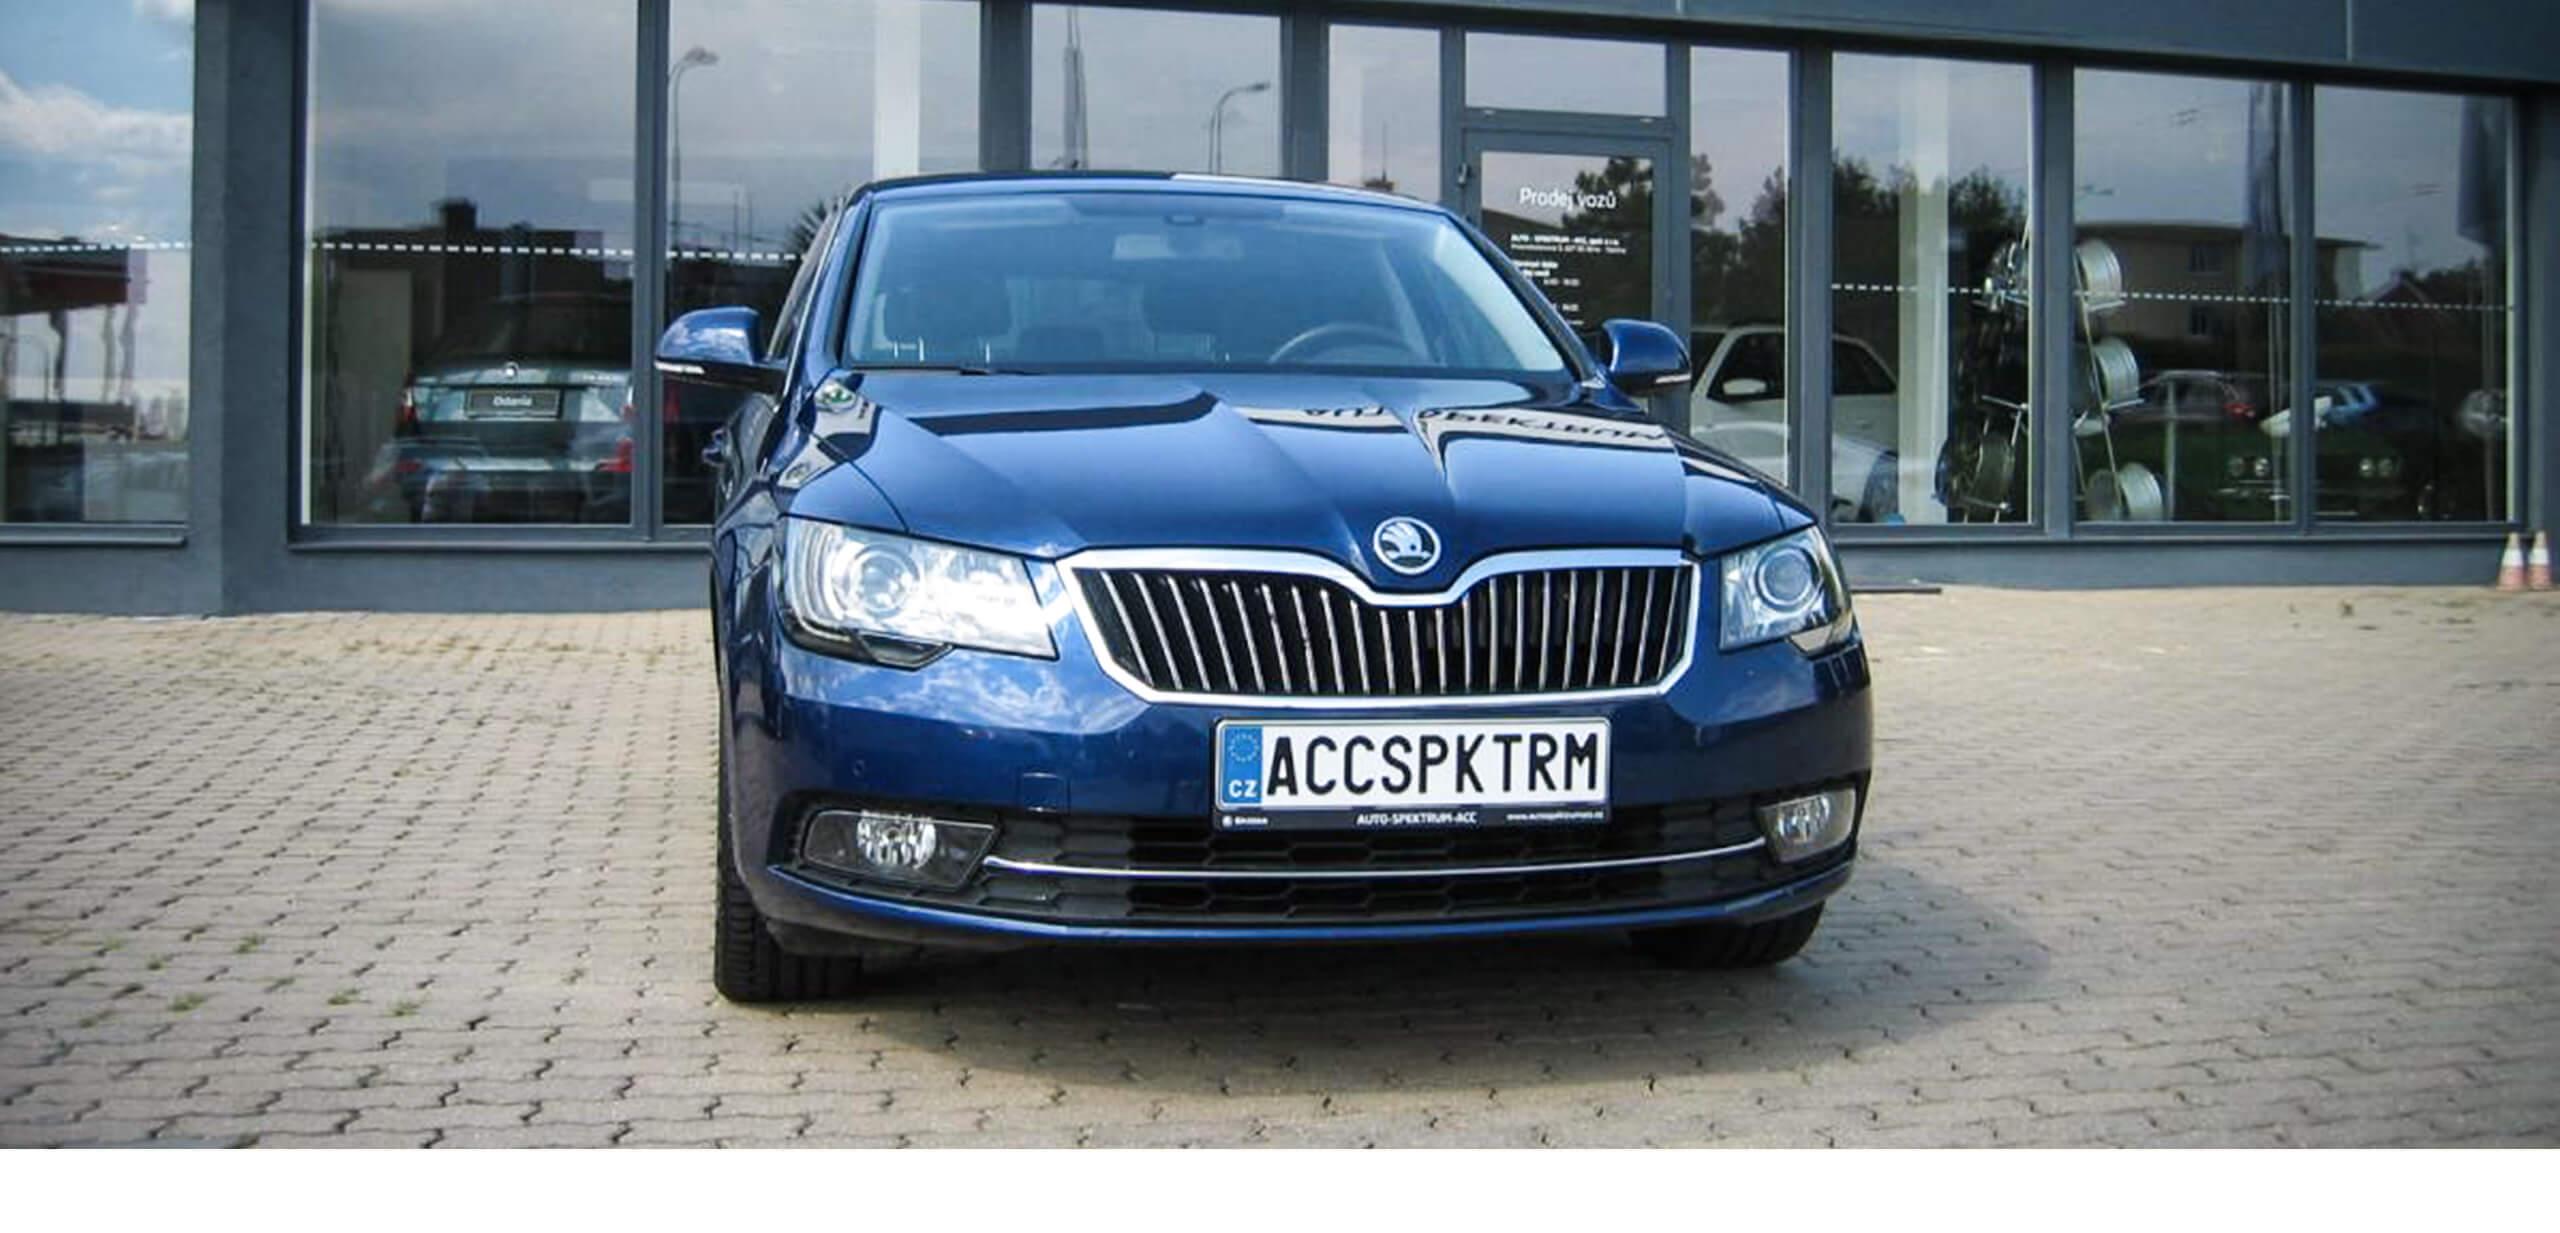 Škoda Superb 2,0TDI/125kW L&K max.výbava